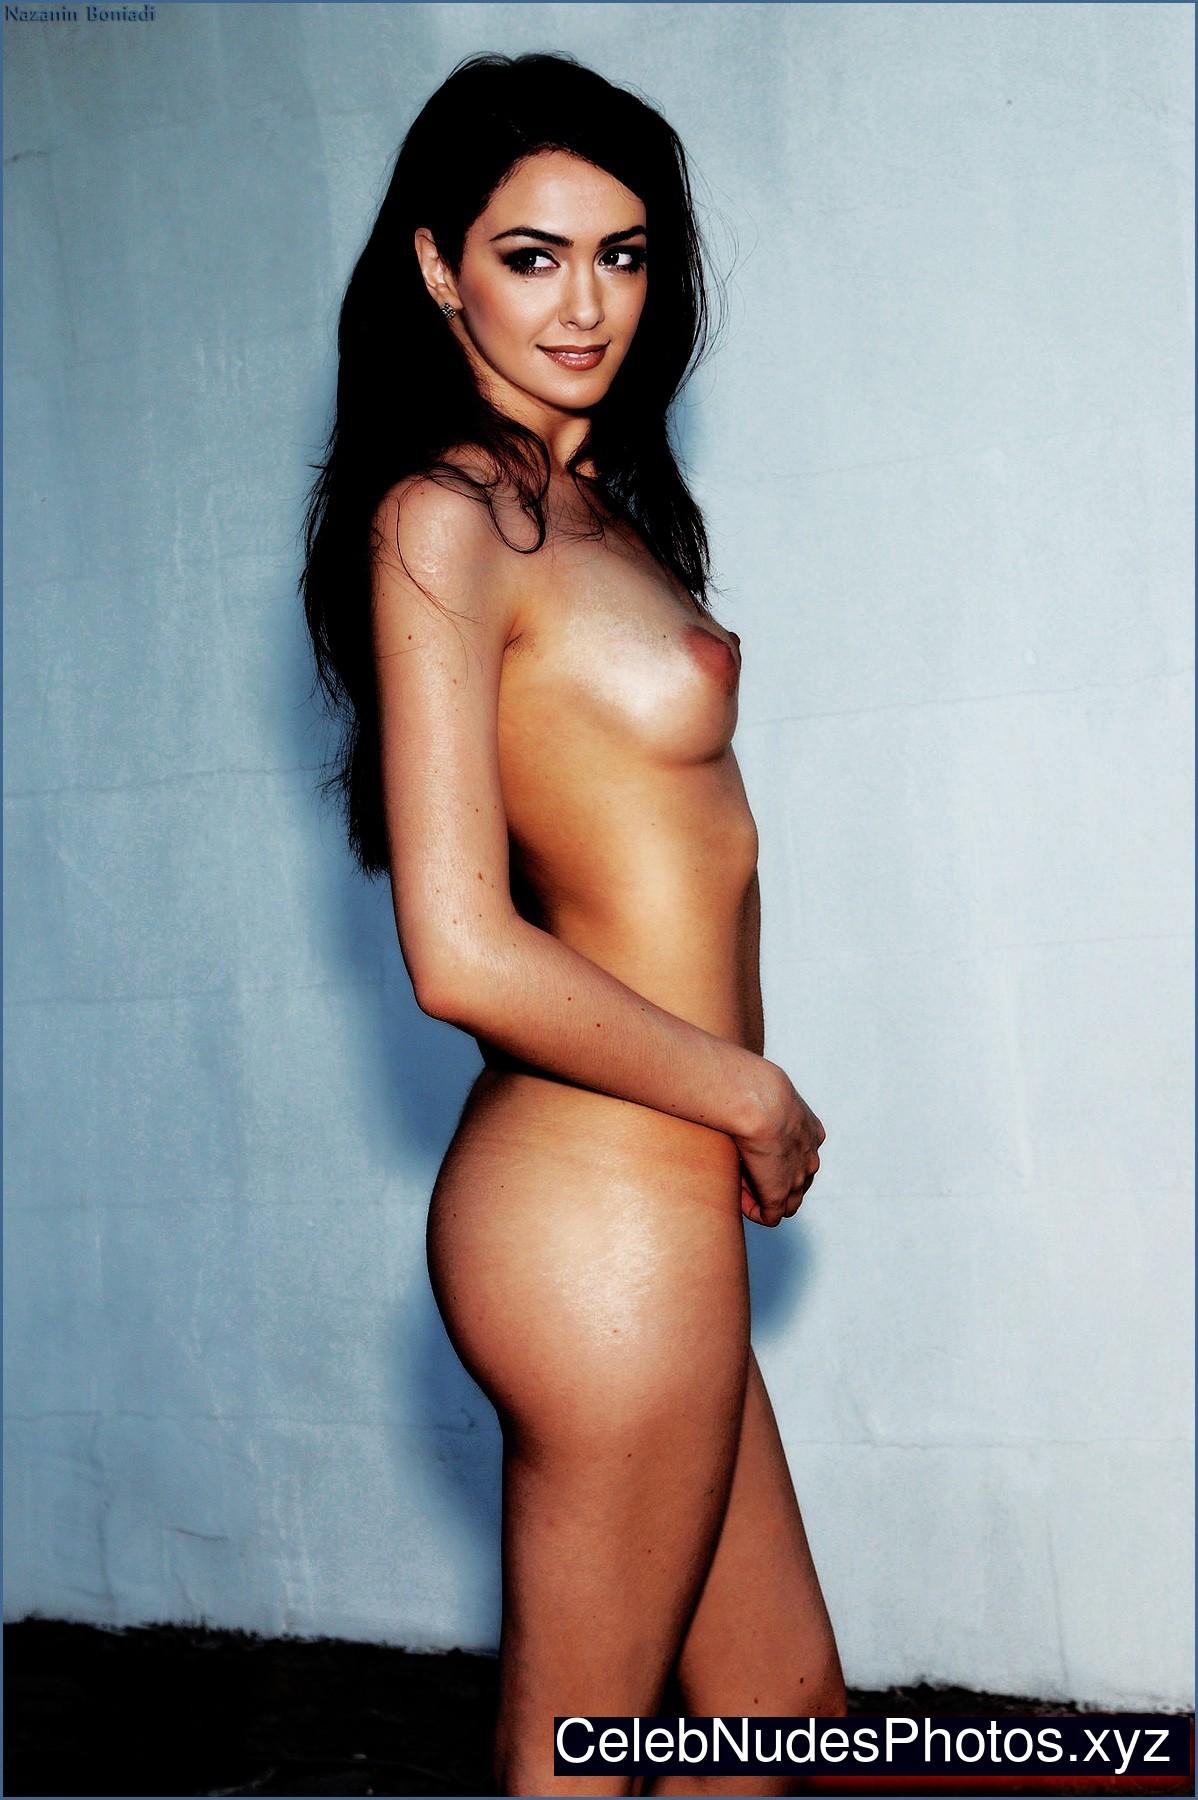 Nazanin Boniadi naked celebrity